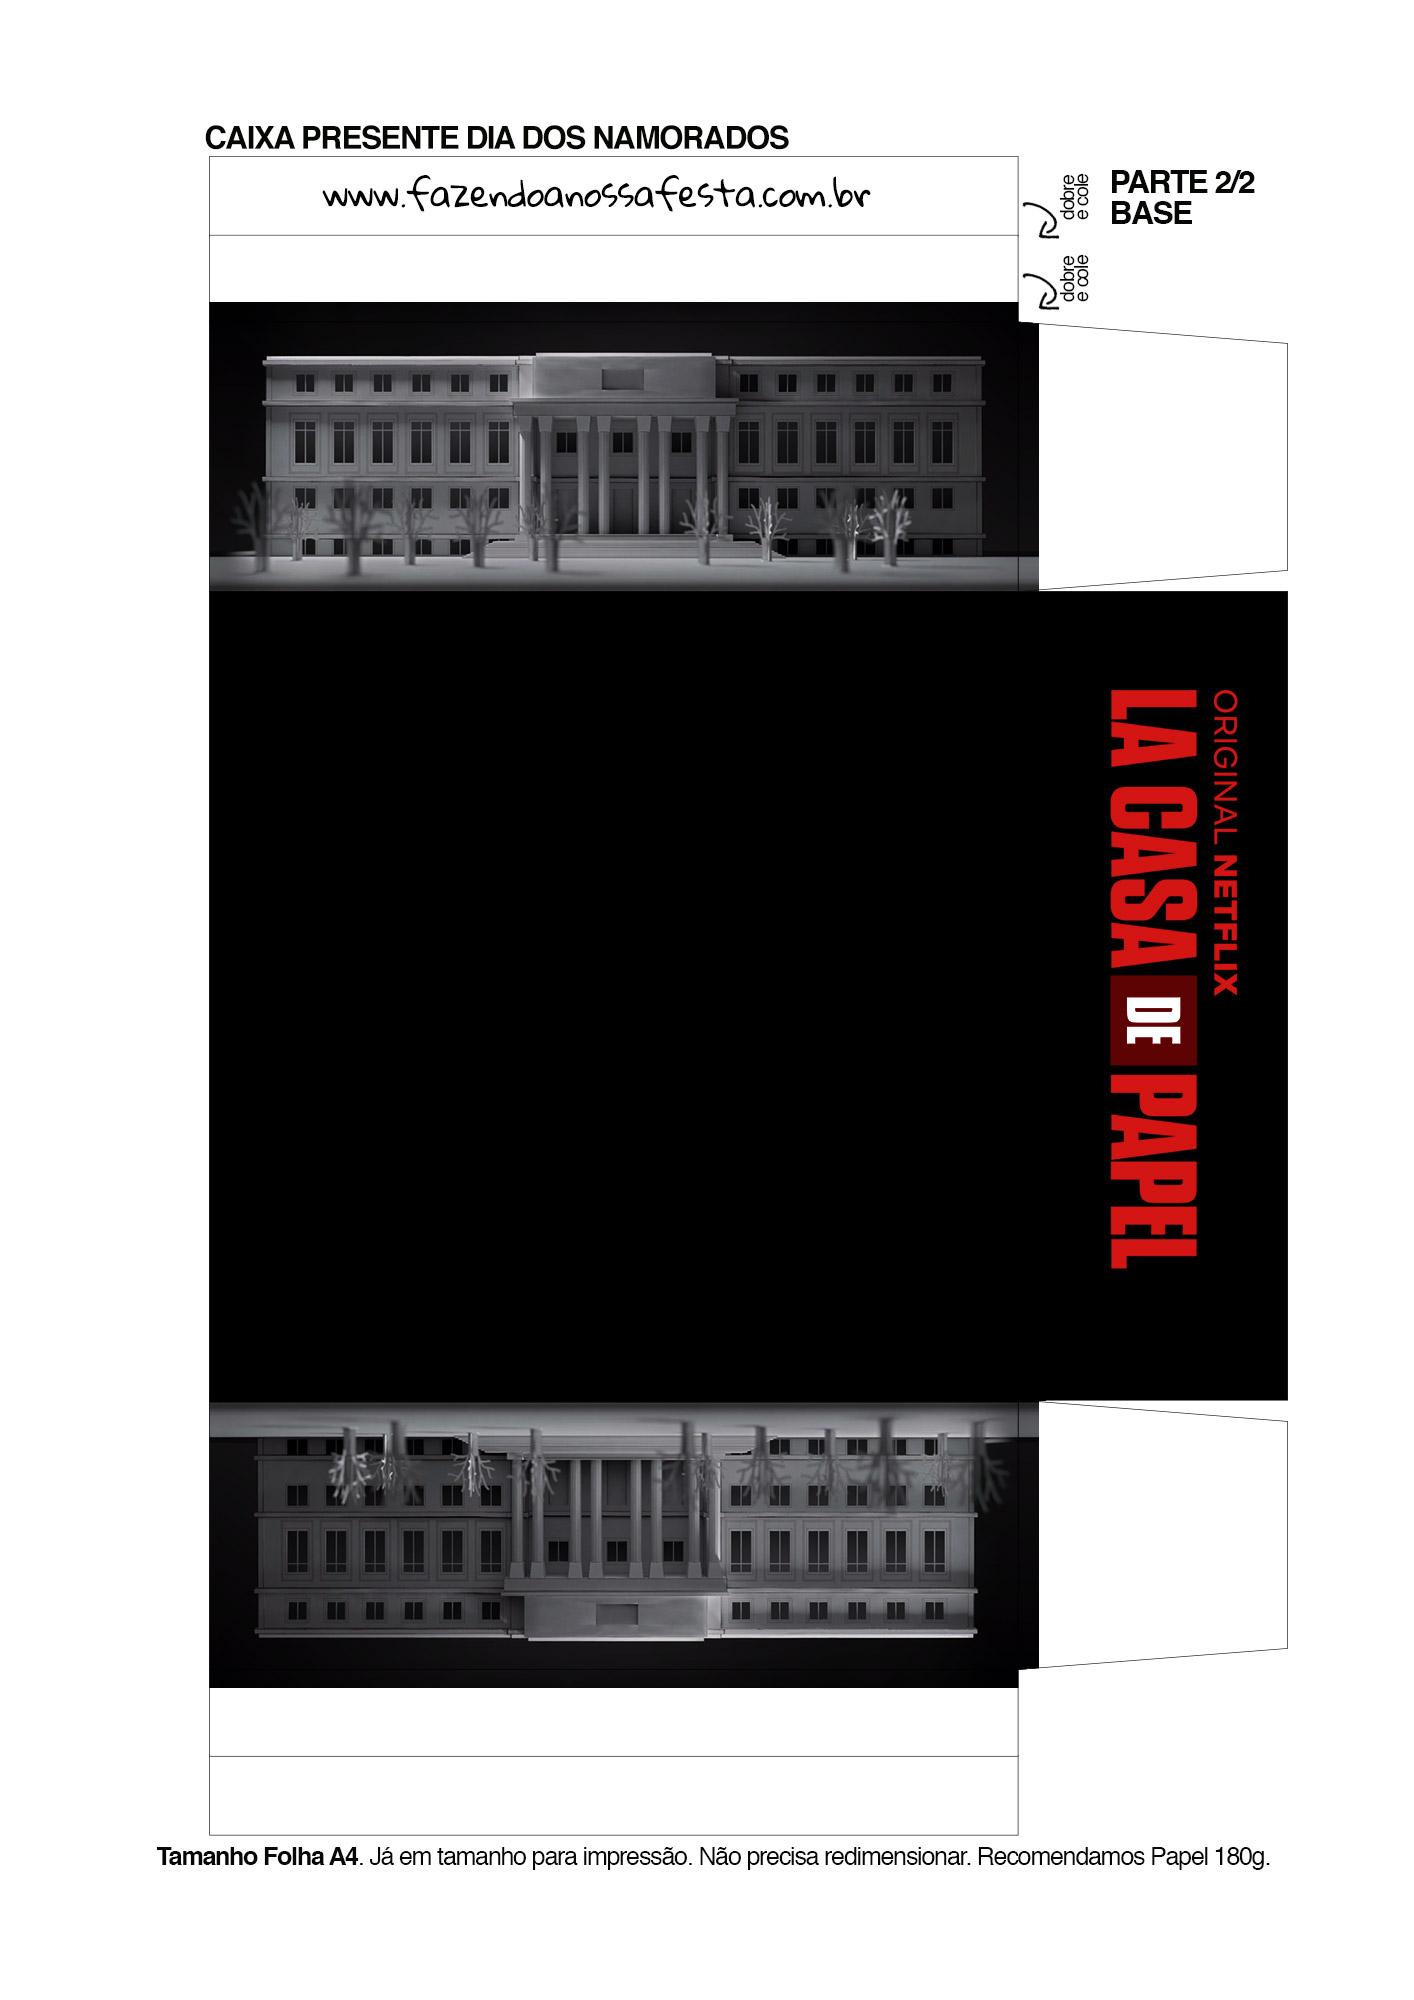 Caixa Brigadeiro La Casa de Papel la casa de papel 2